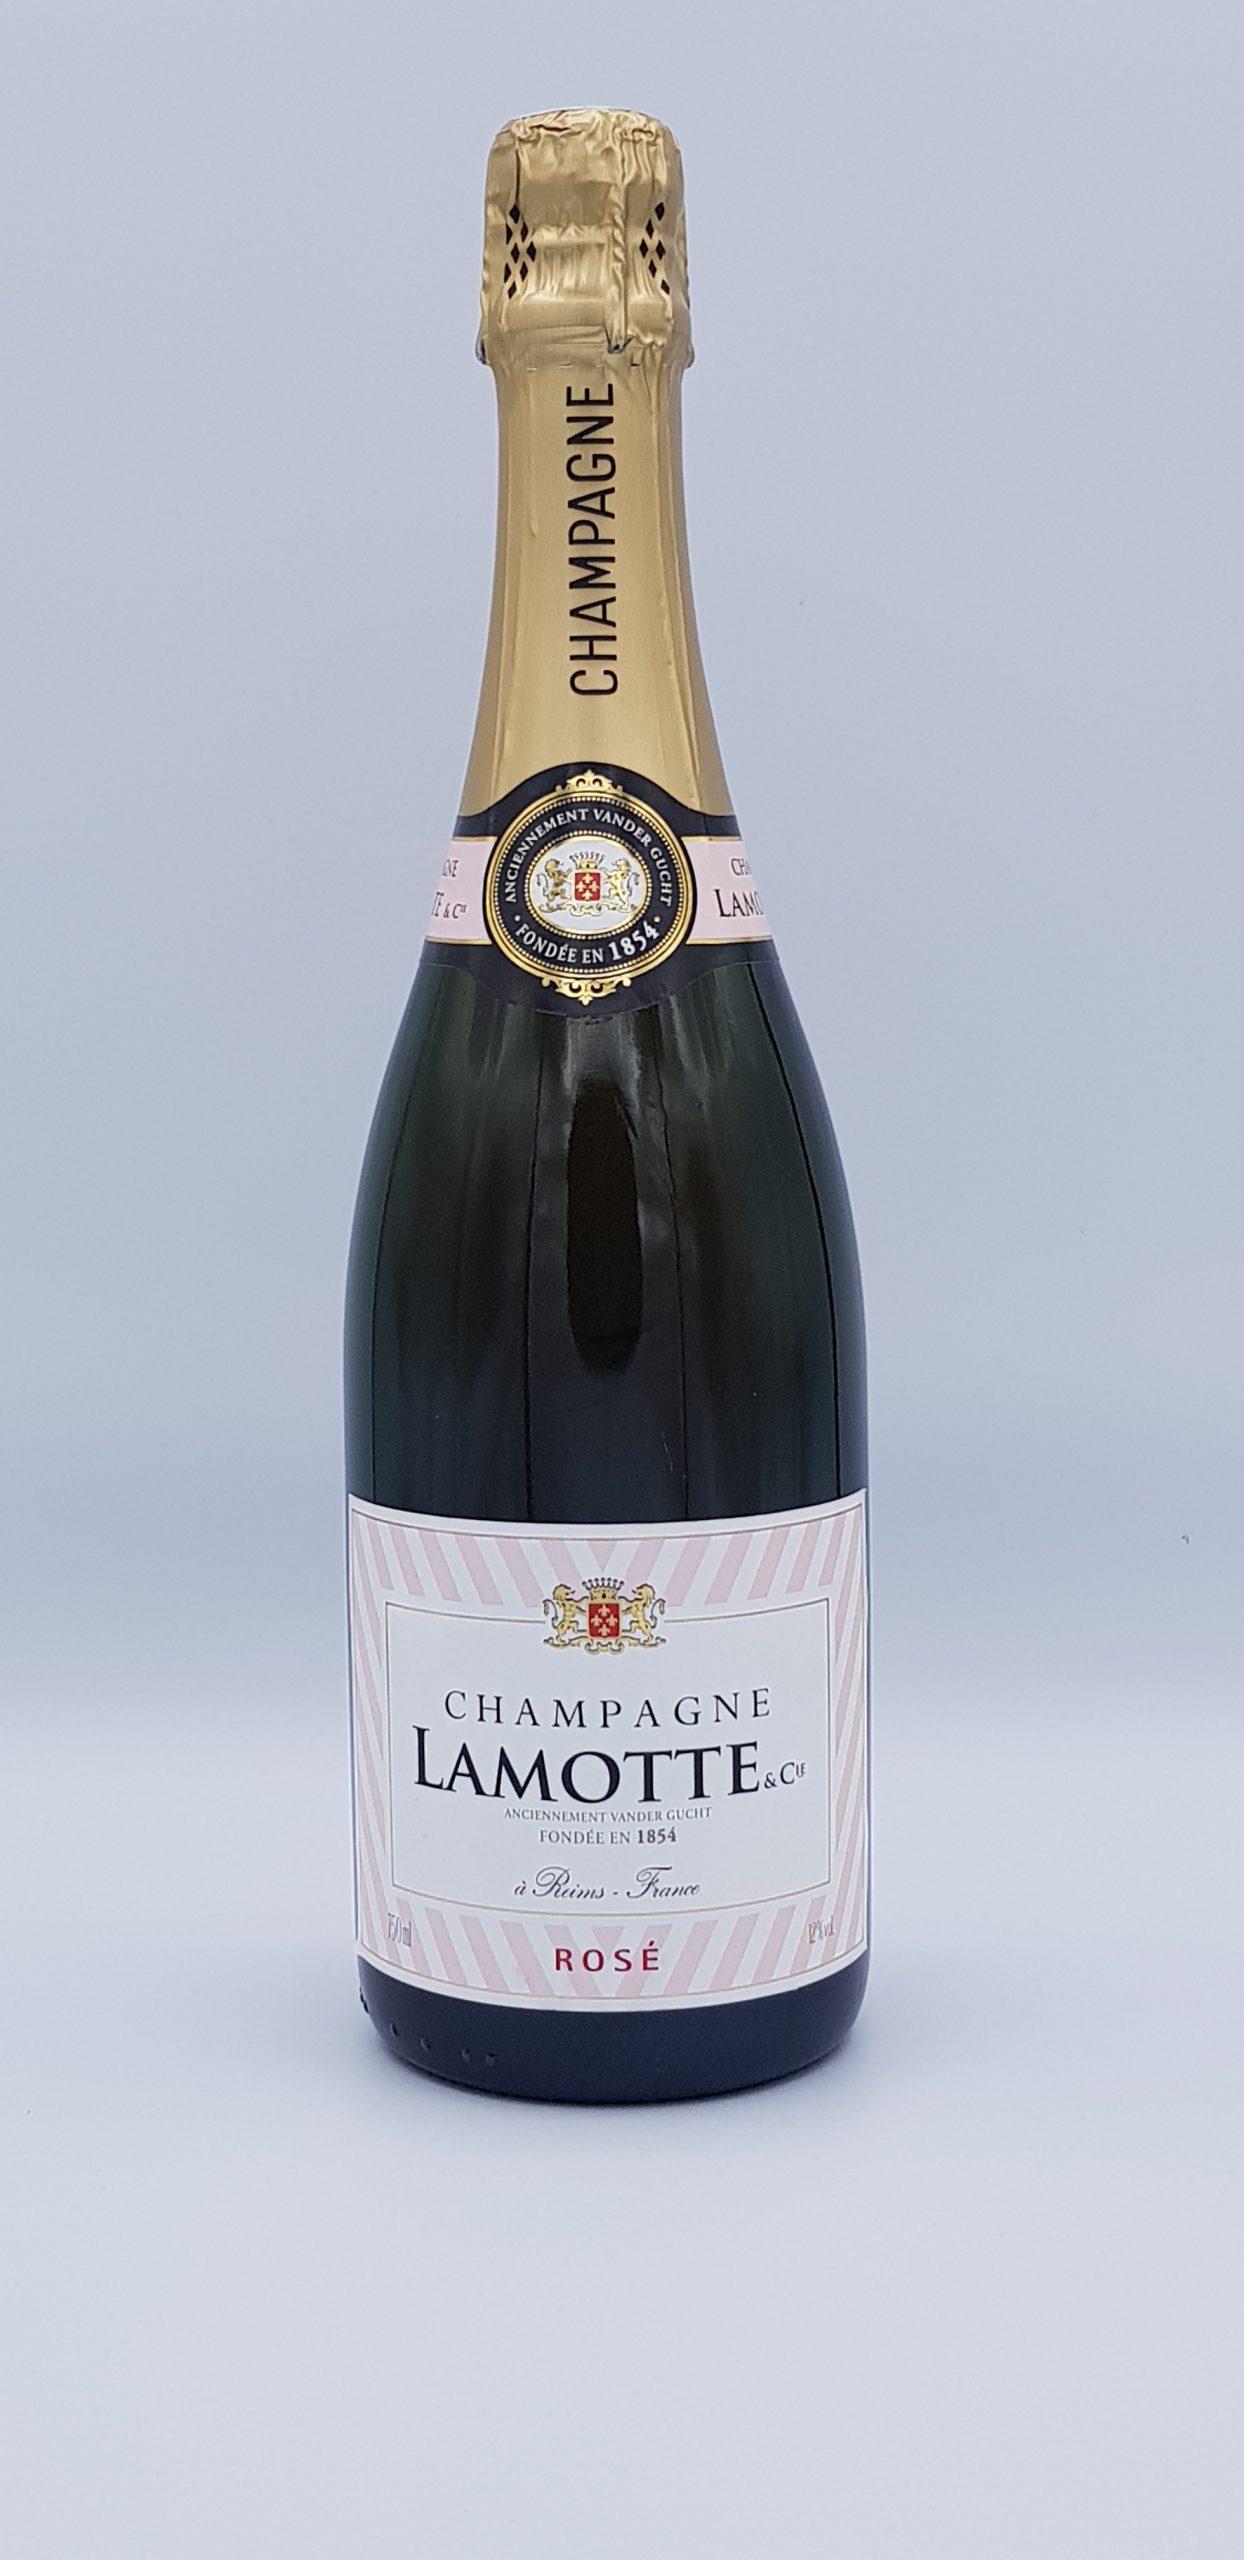 Champagne Lamotte Rose